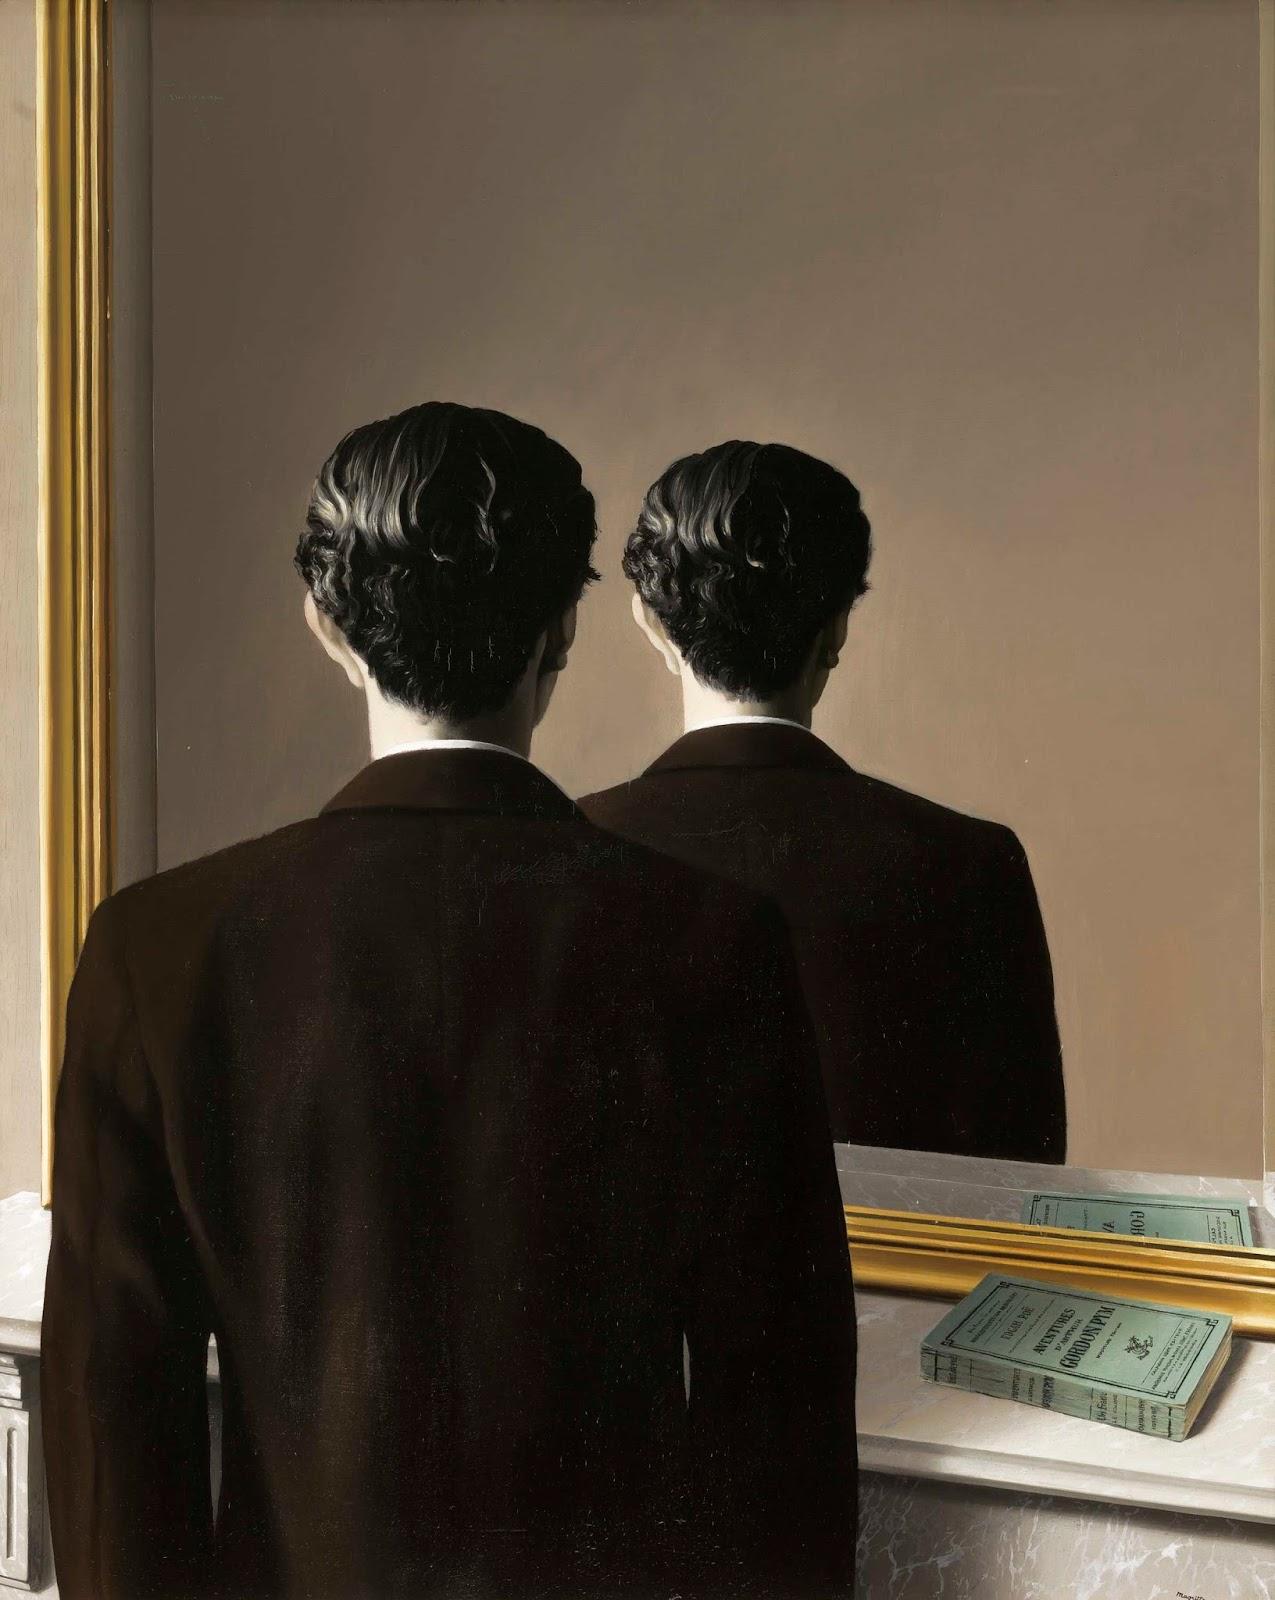 Oh Arabia Felix: Un hombre frente al espejo